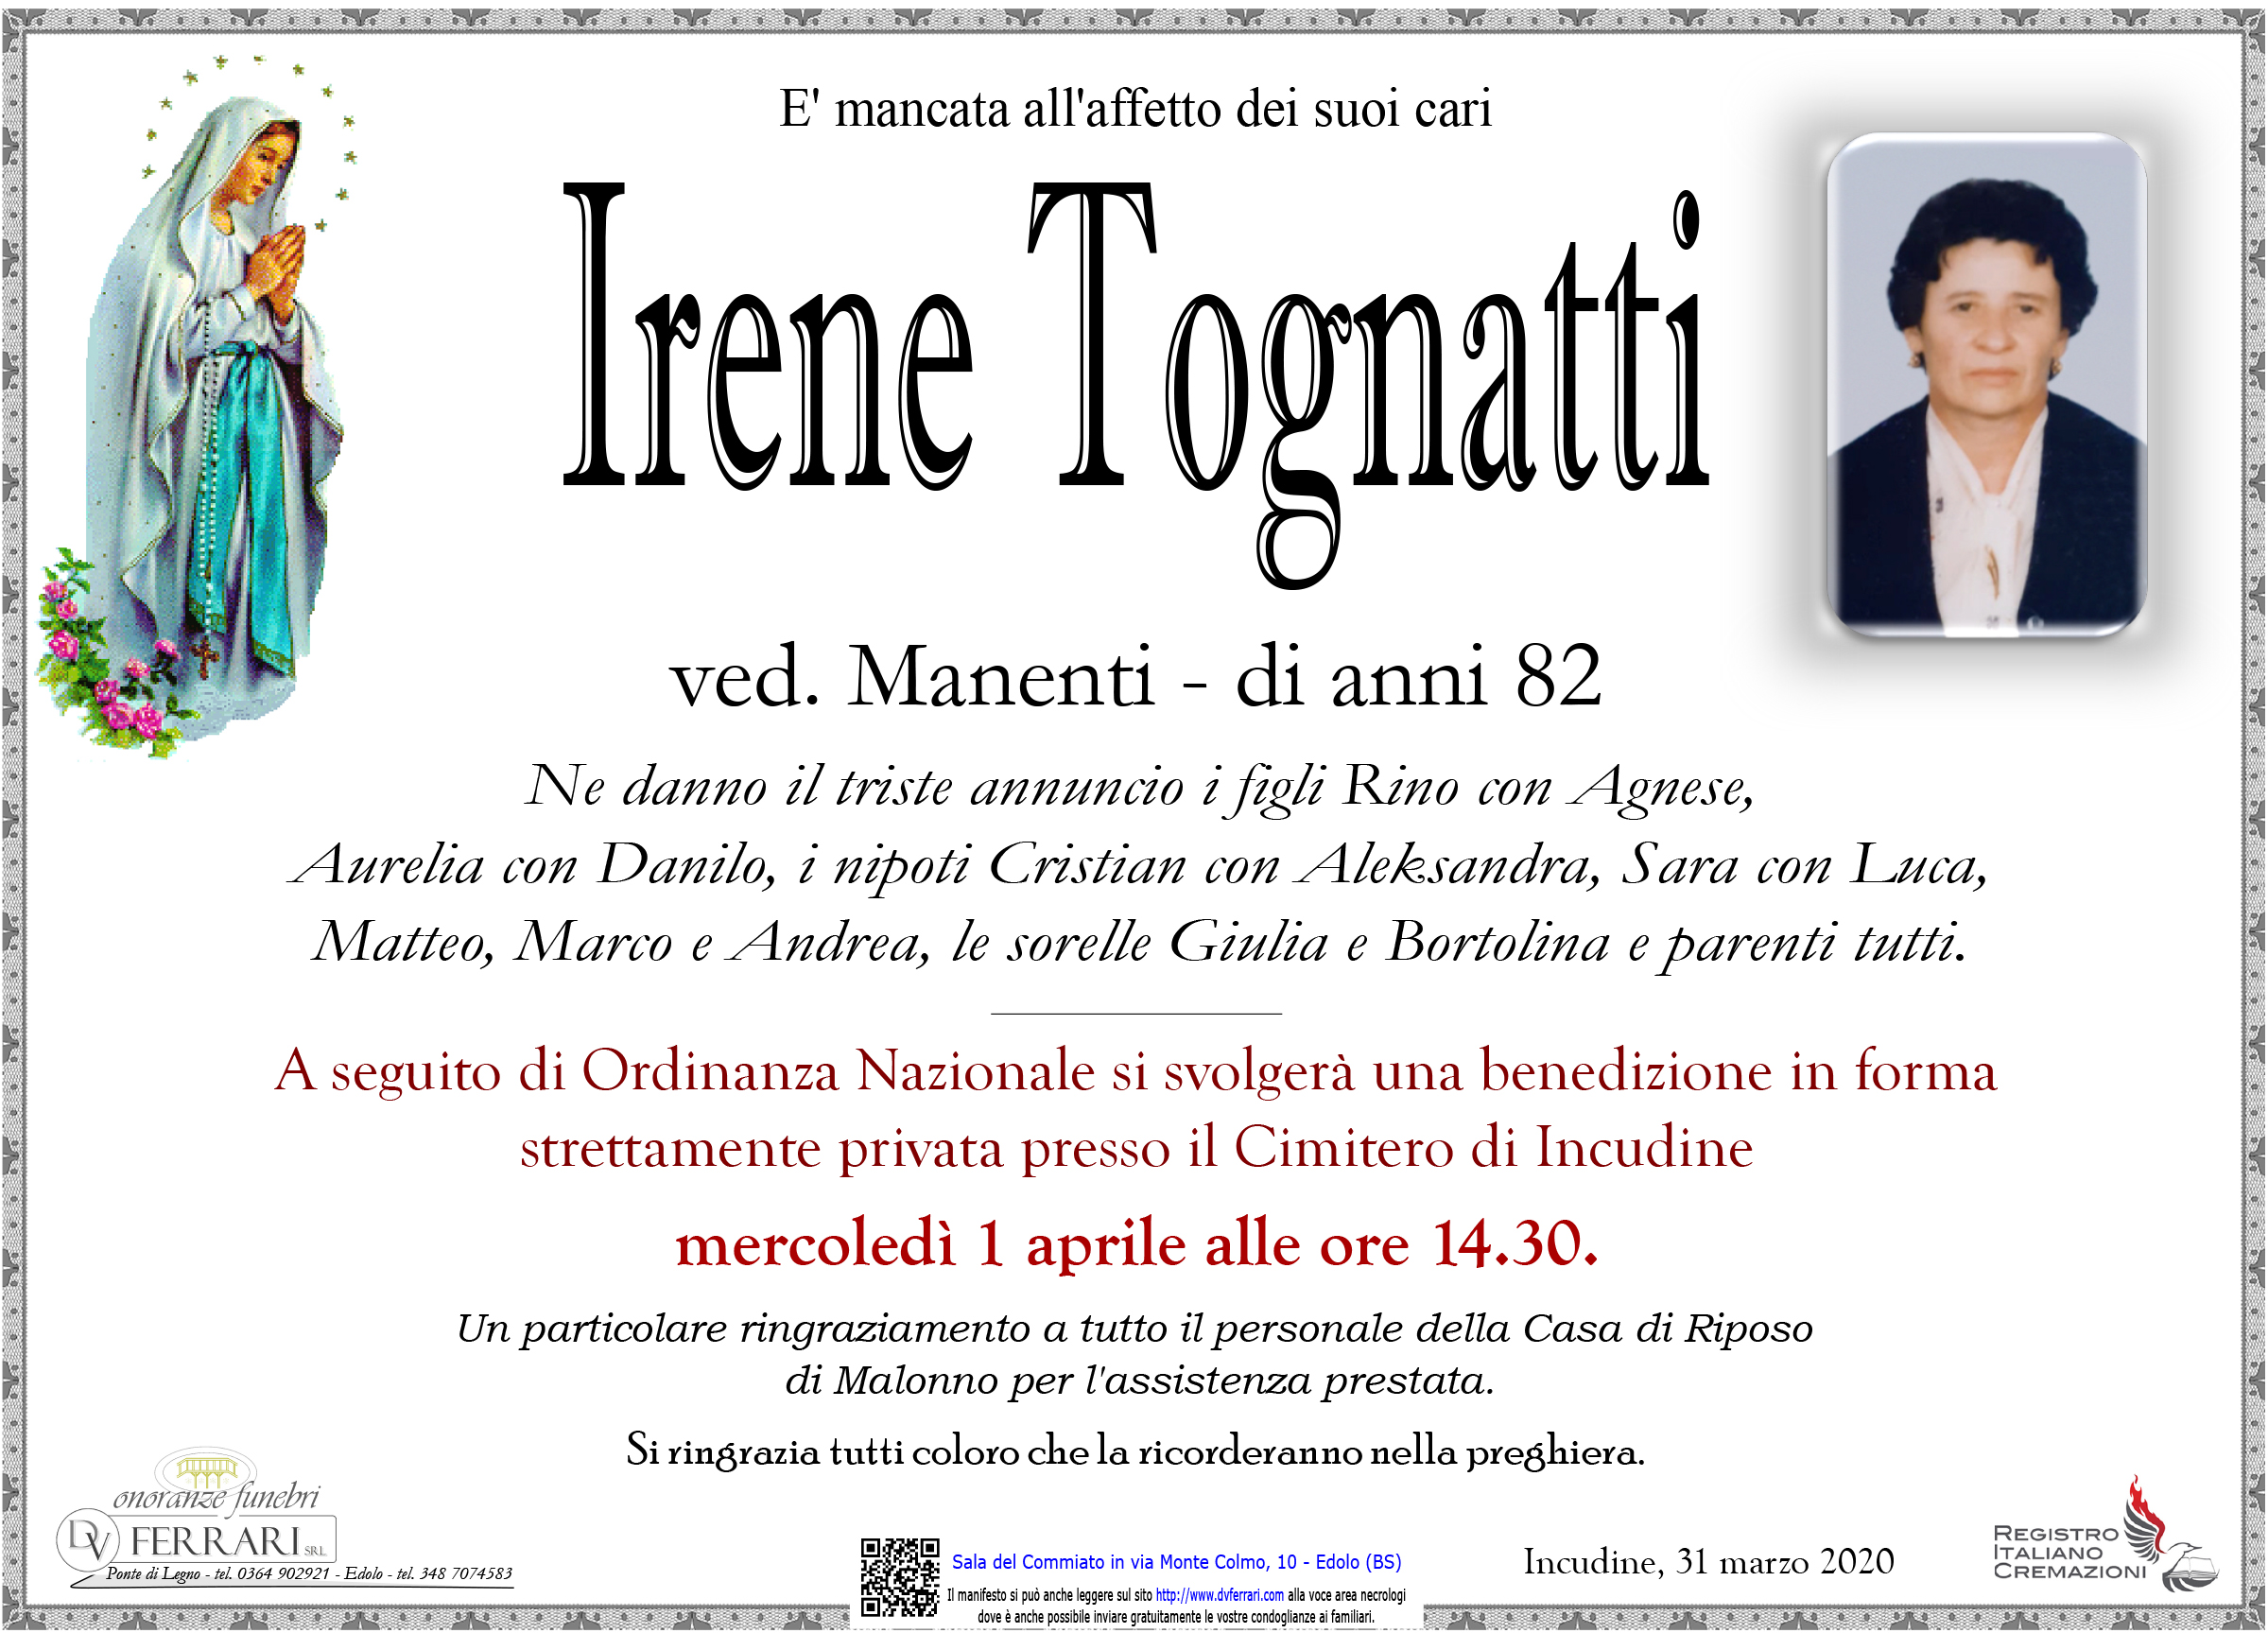 IRENE TOGNATTI VED. MANENTI - INCUDINE